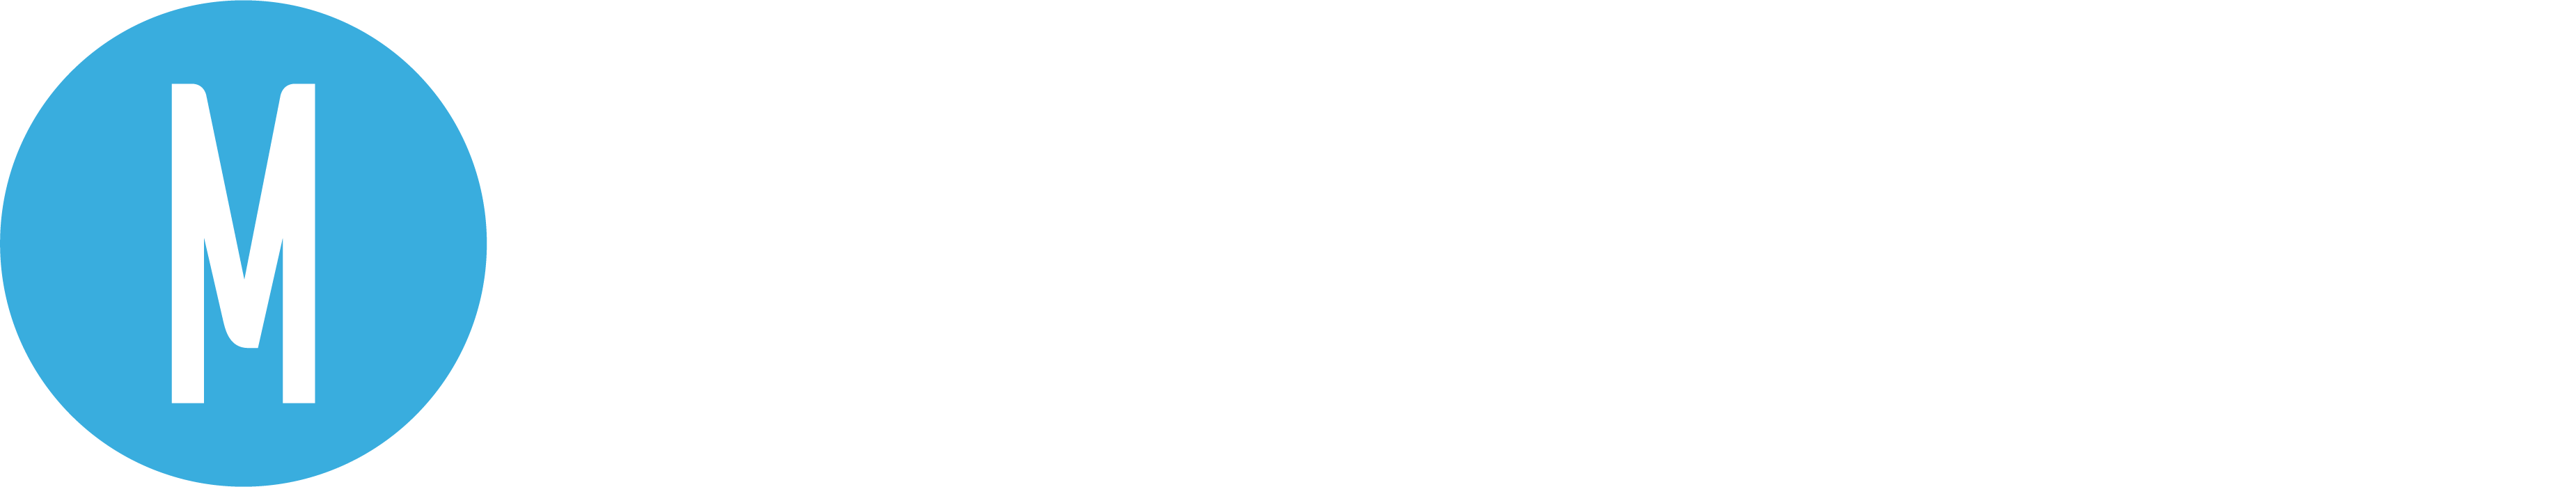 LOGO TOTMEDIA